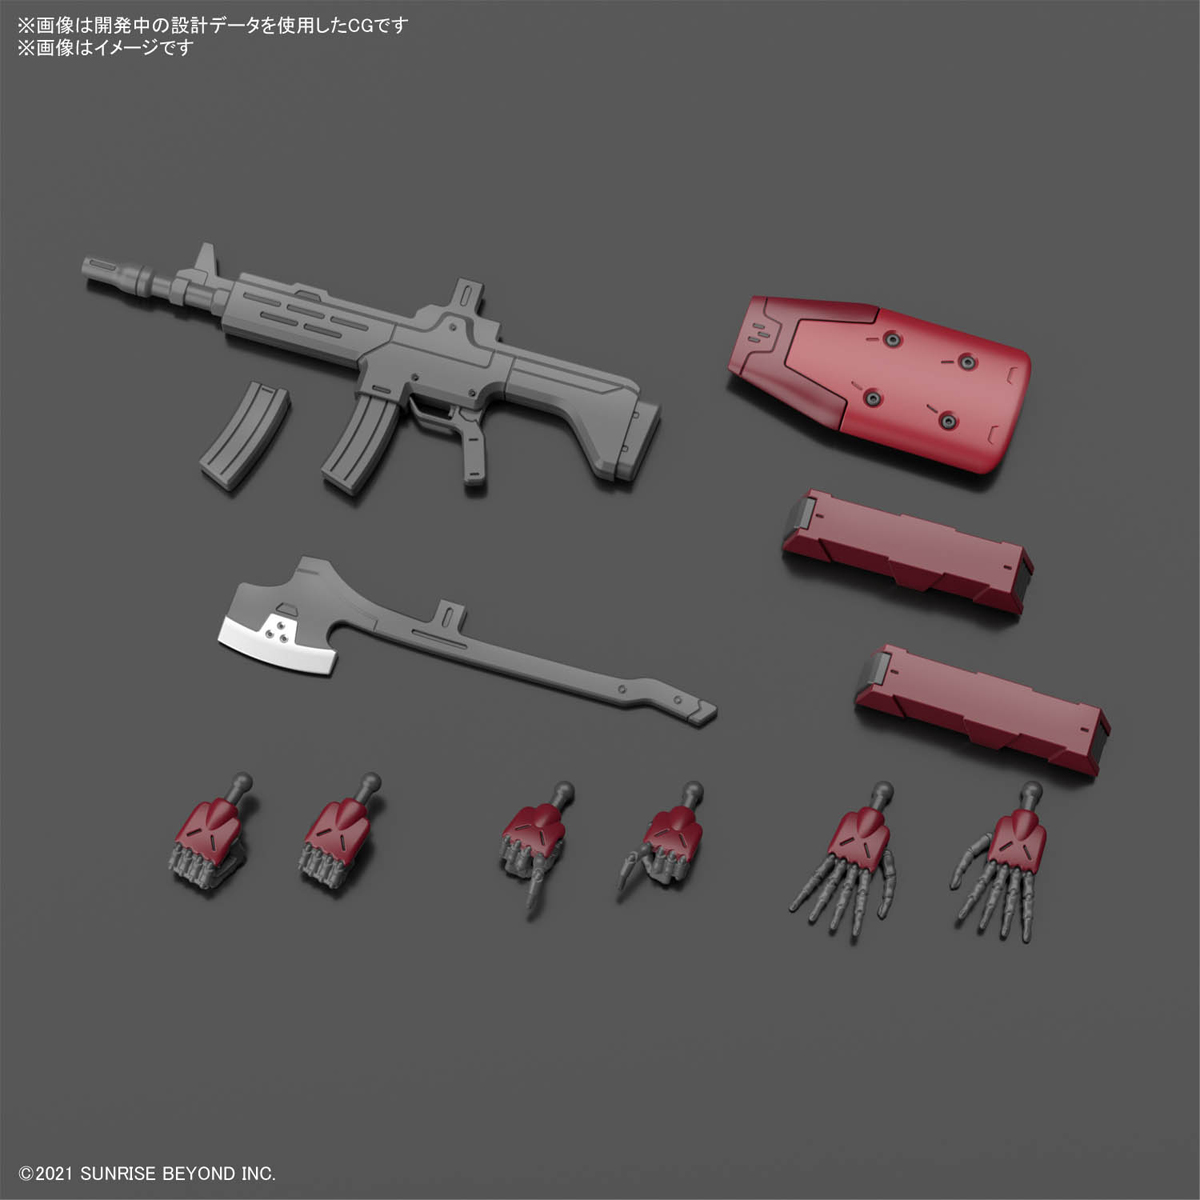 HG 1/72『ブレイディハウンド』境界戦機 プラモデル-016